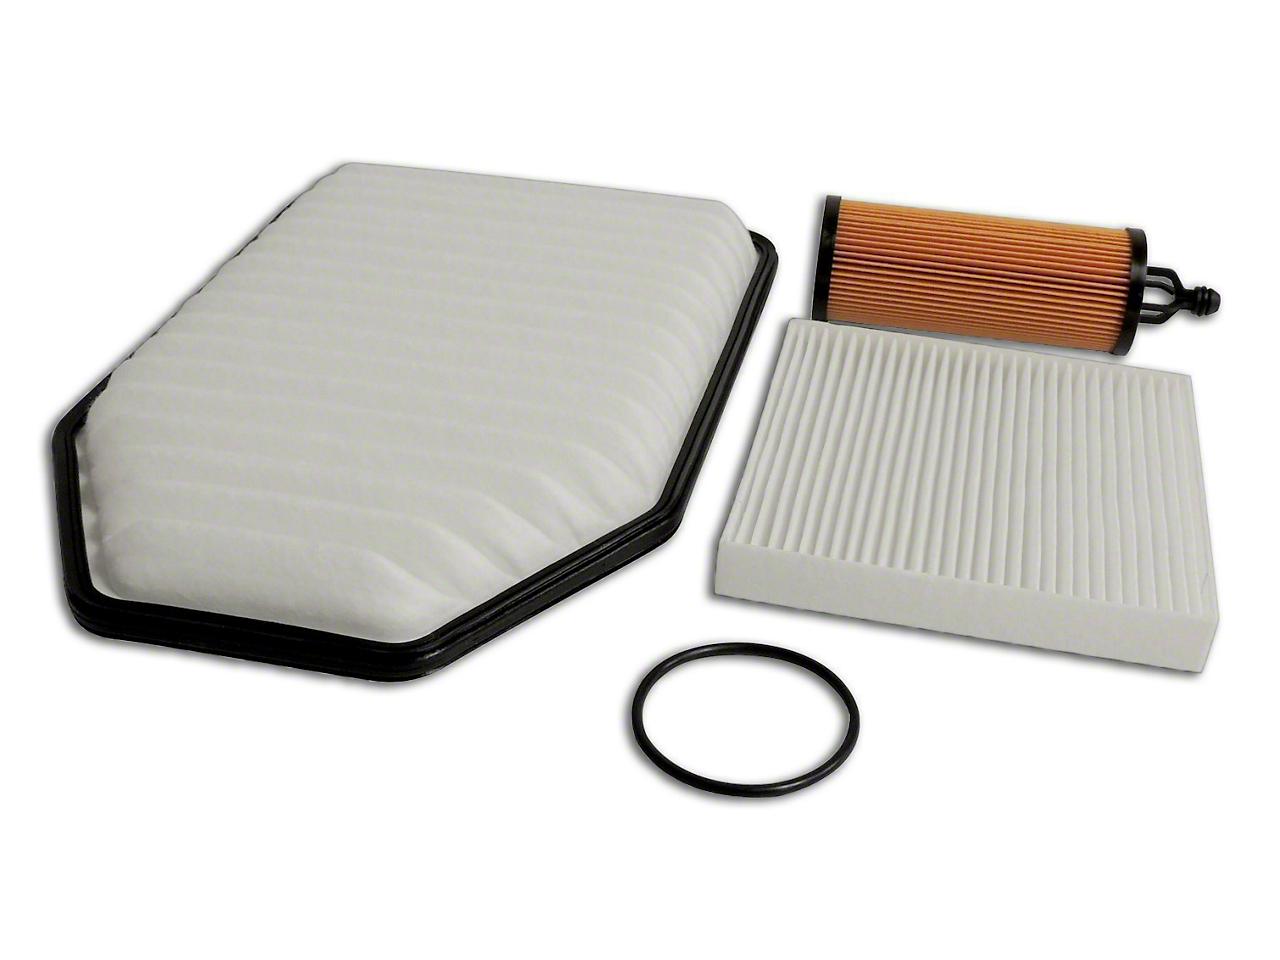 Crown Automotive Master Filter Kit (14-18 3.6L Jeep Wrangler JK)